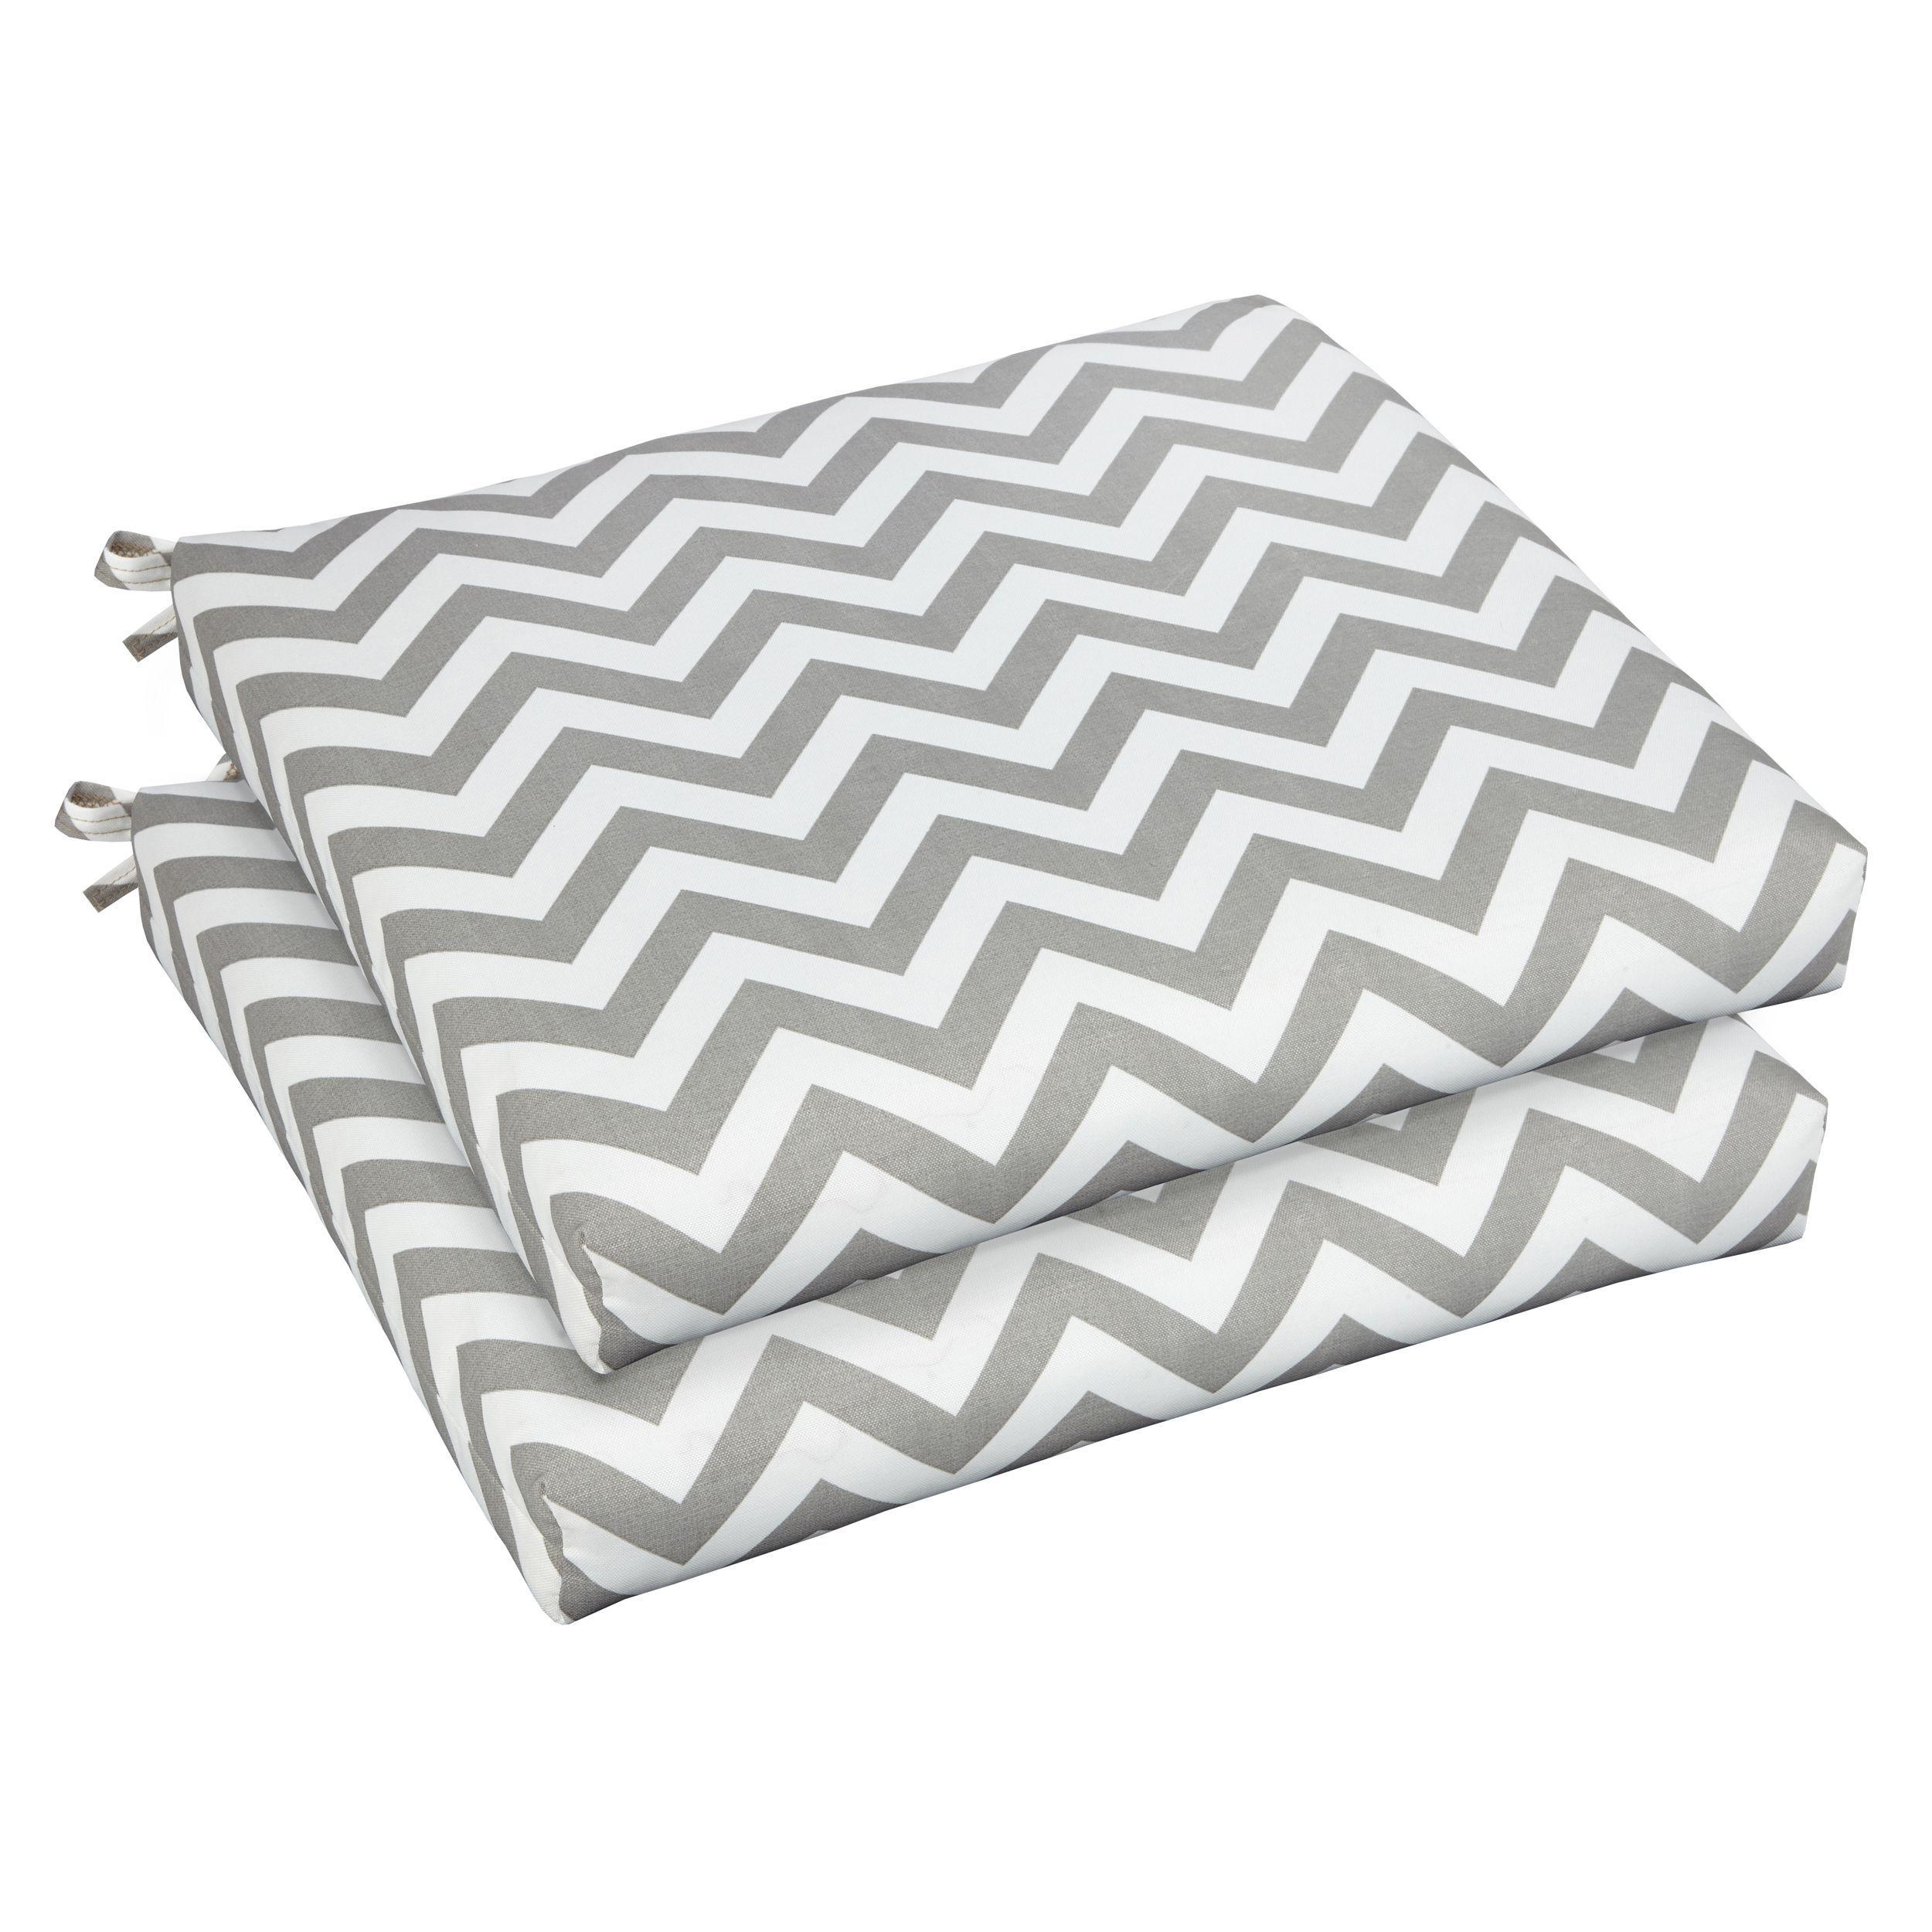 Bristol 19-inch Indoor/ Outdoor Chevron Grey Chair Cushion Set (OSCS2947) (Fabric), Outdoor Cushion